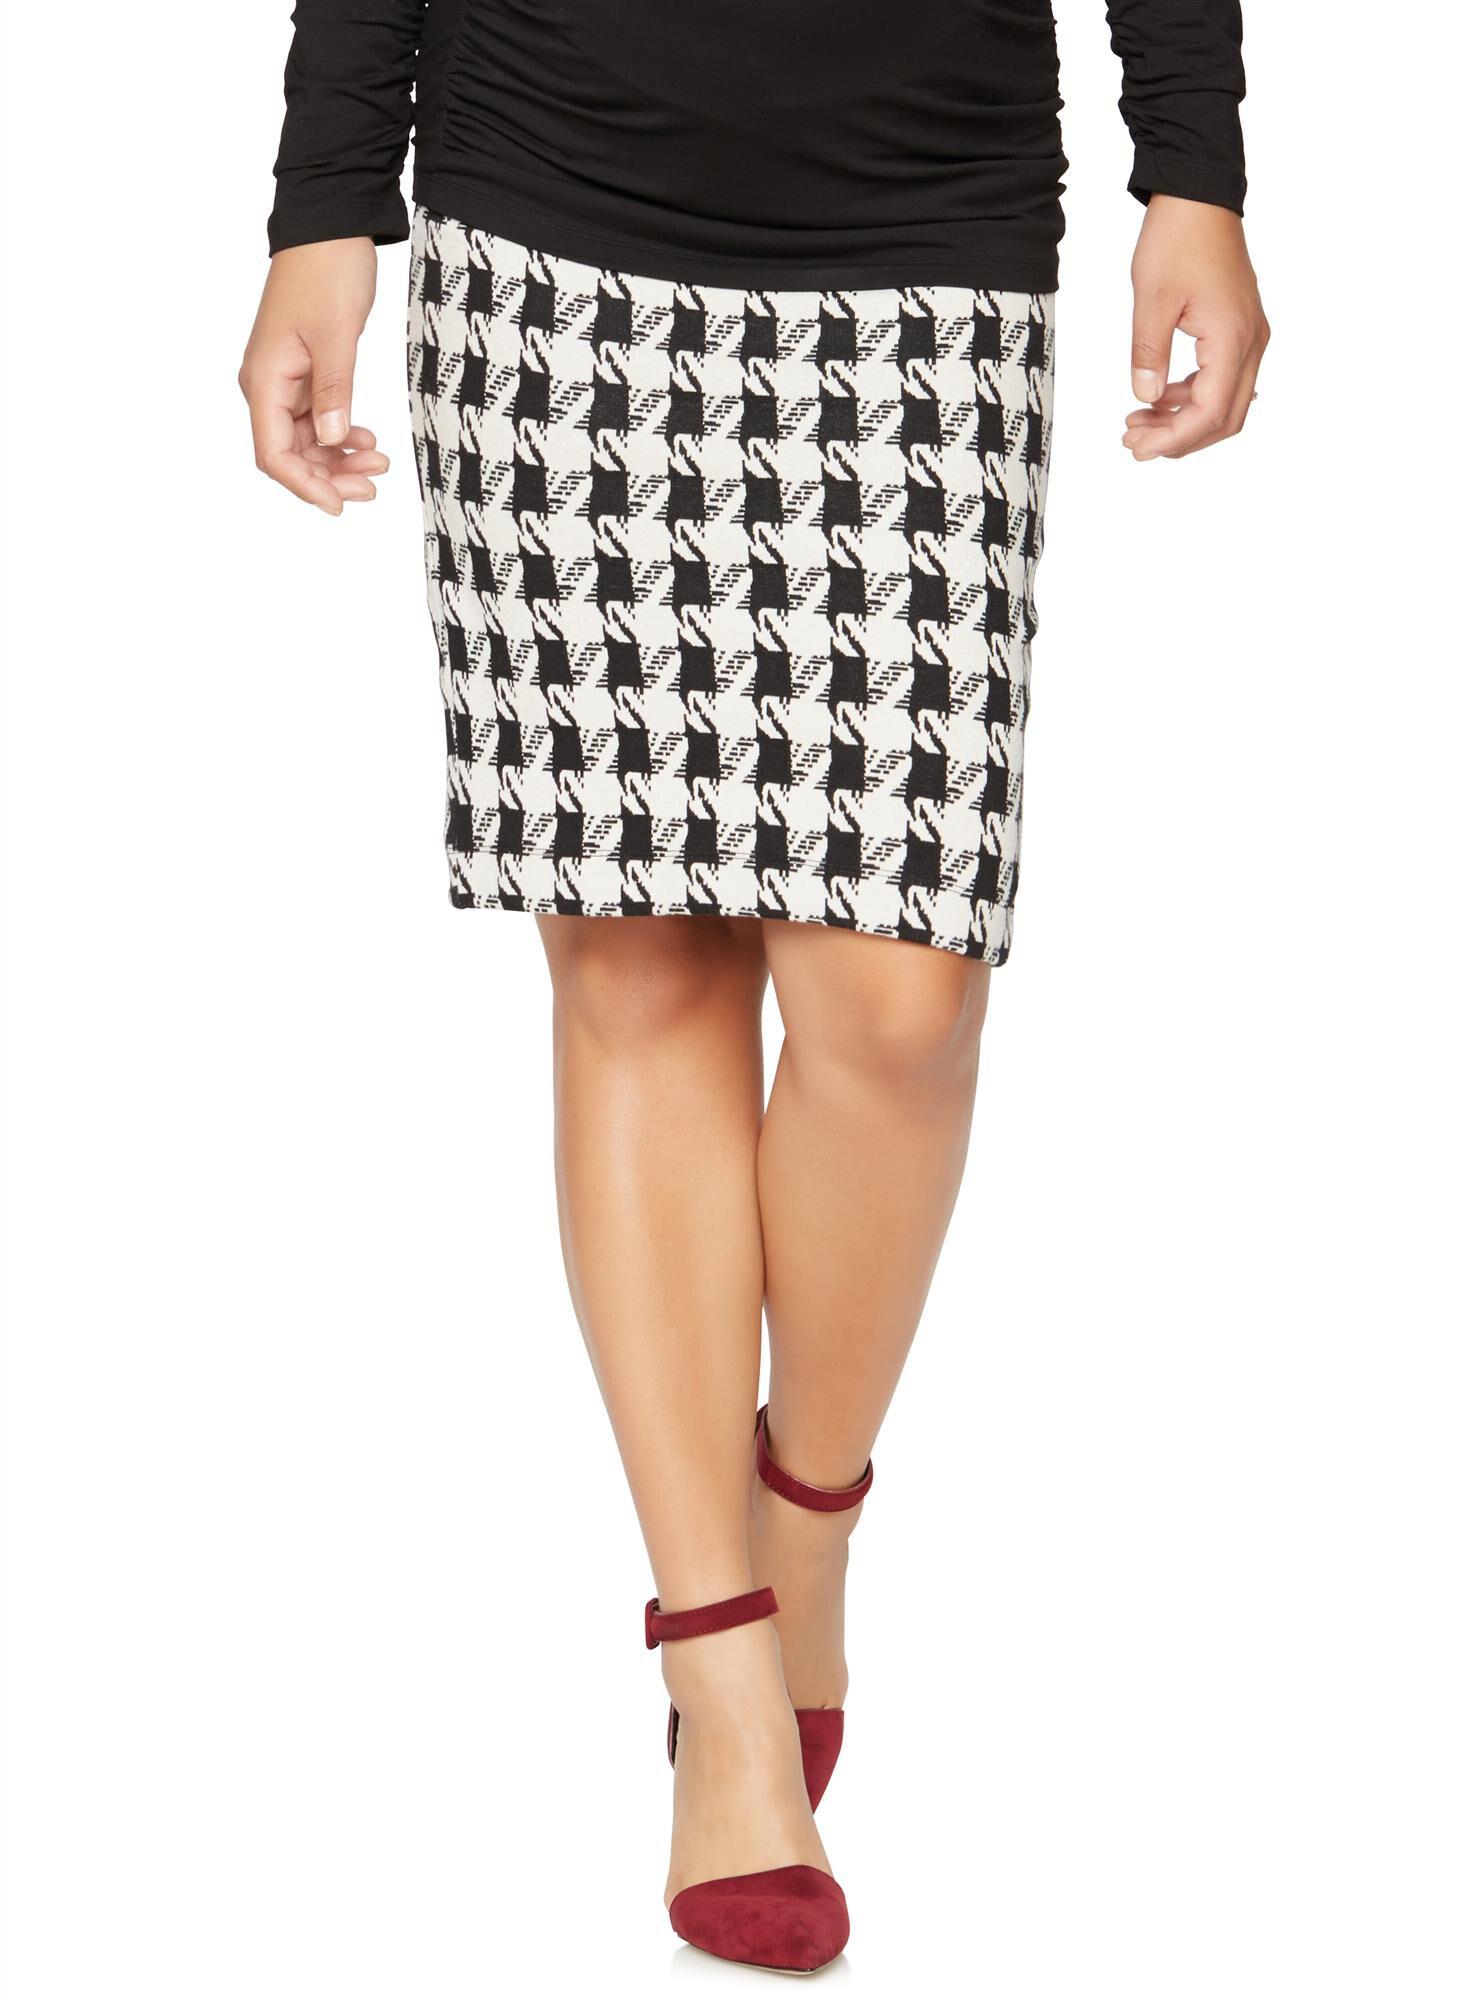 Isabella Oliver Houndstooth Maternity Skirt